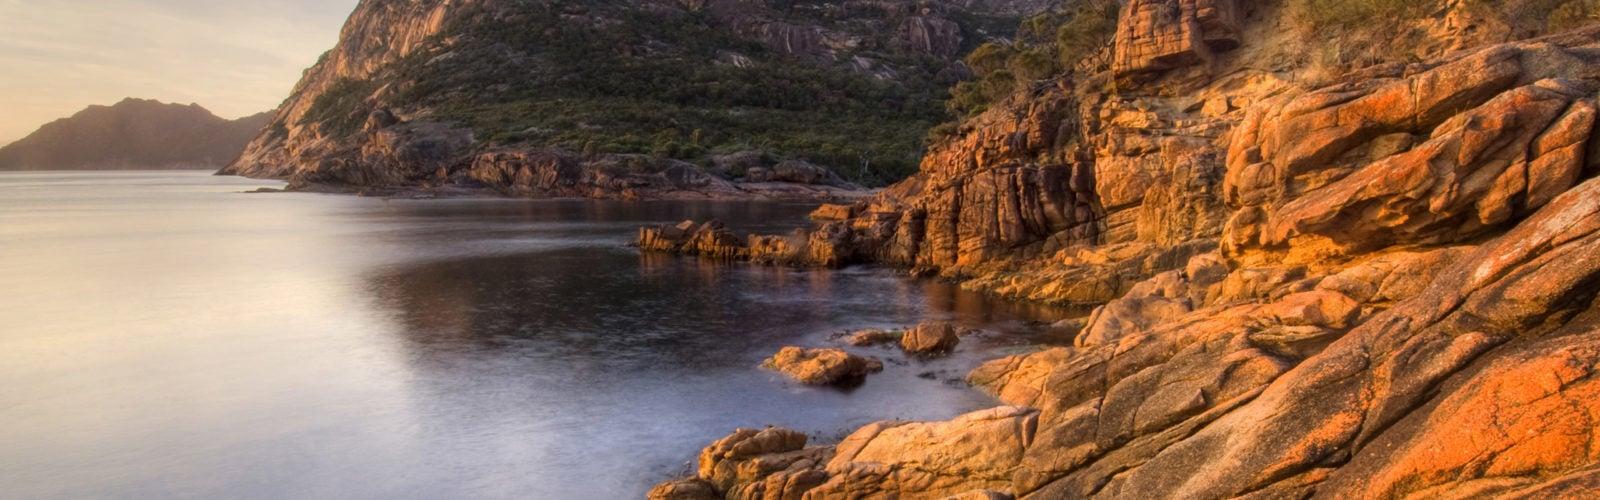 freycinet-national-park-tasmania